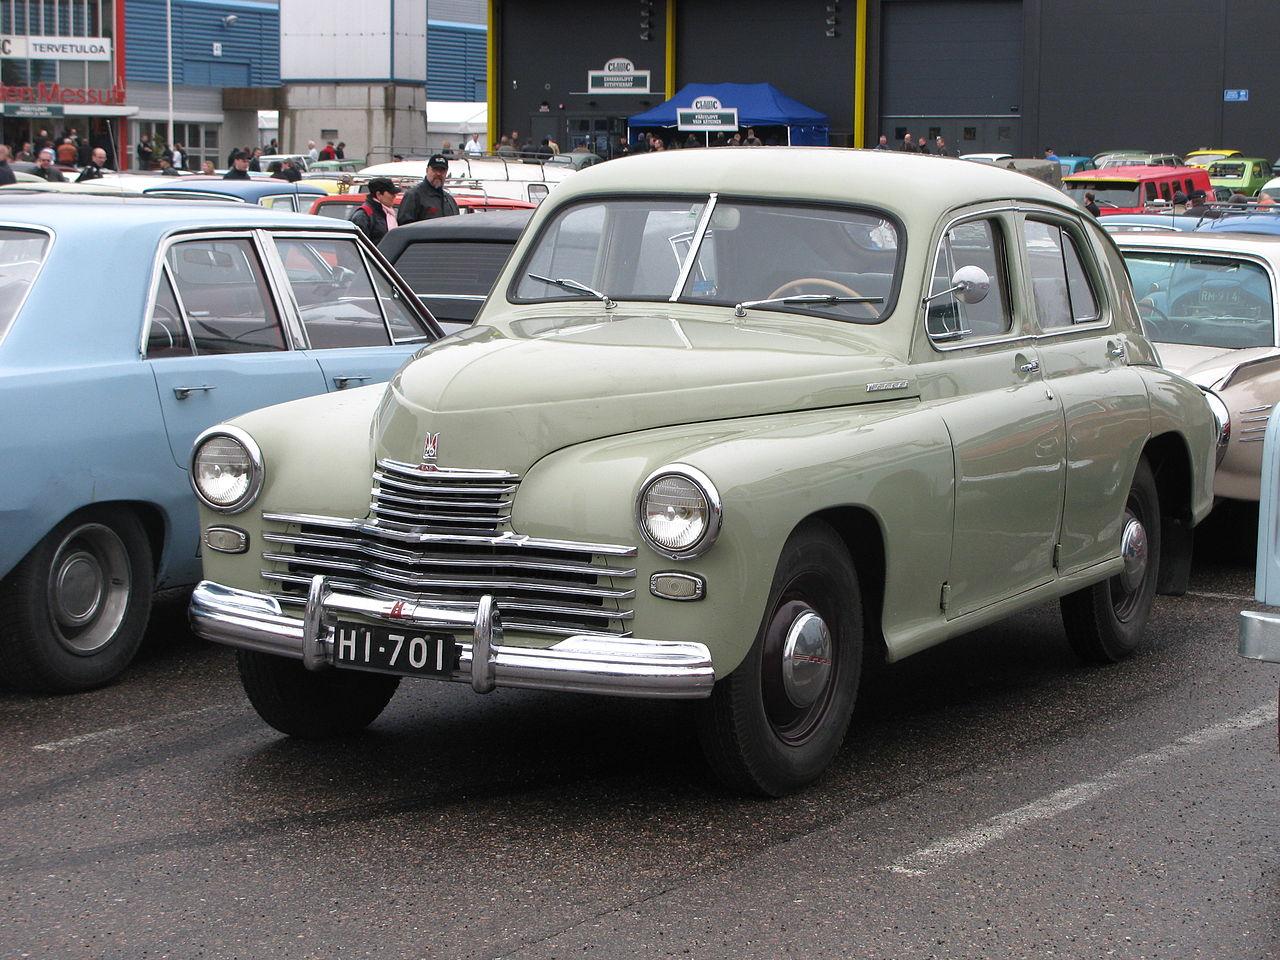 ГАЗ-М20 «Победа» — советская легенда